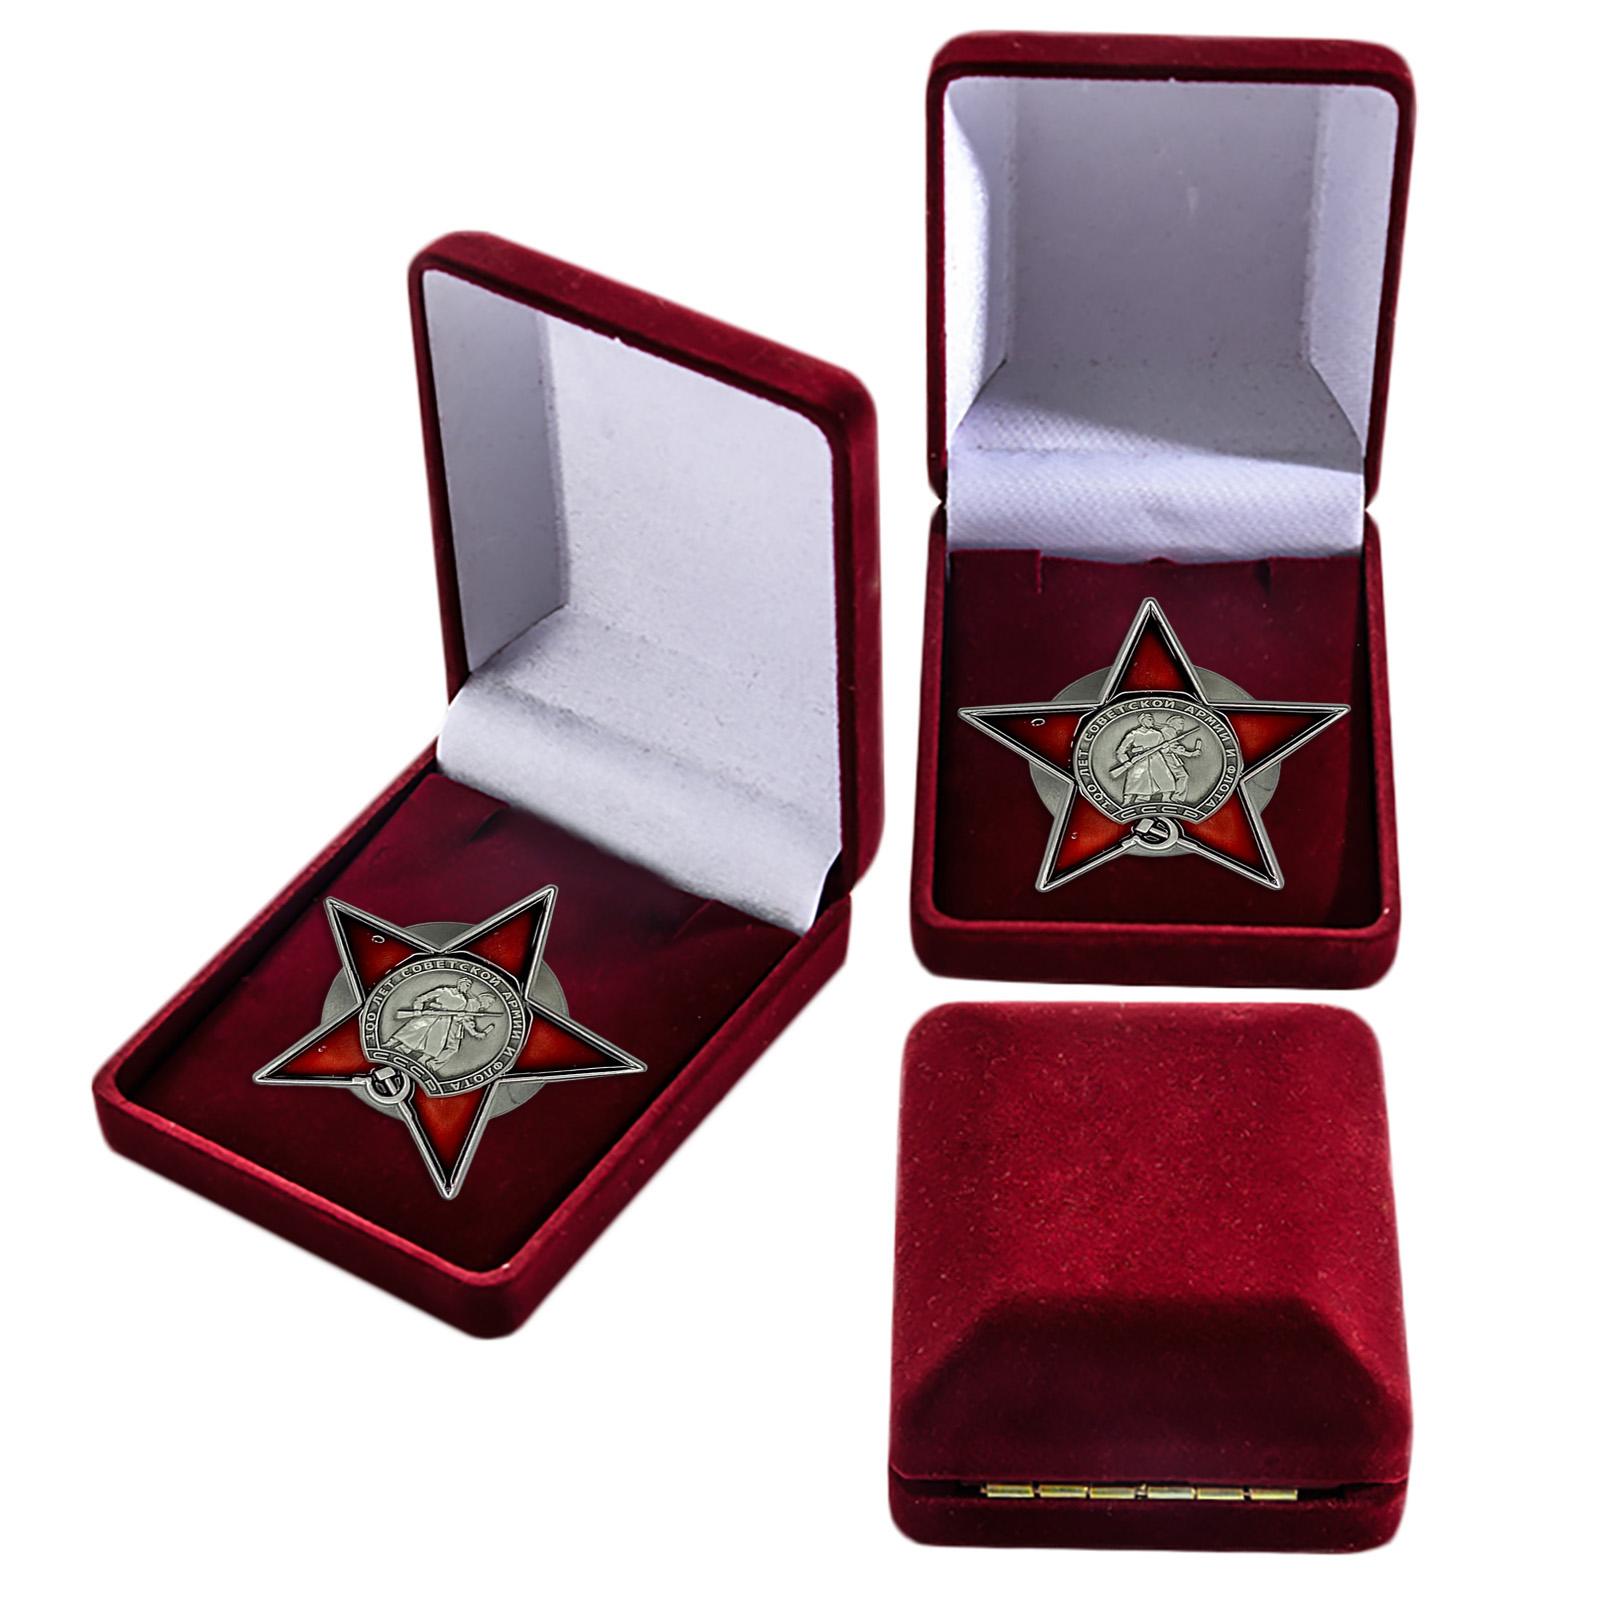 "Орден ""100 лет Армии и Флоту"" фалеристам"